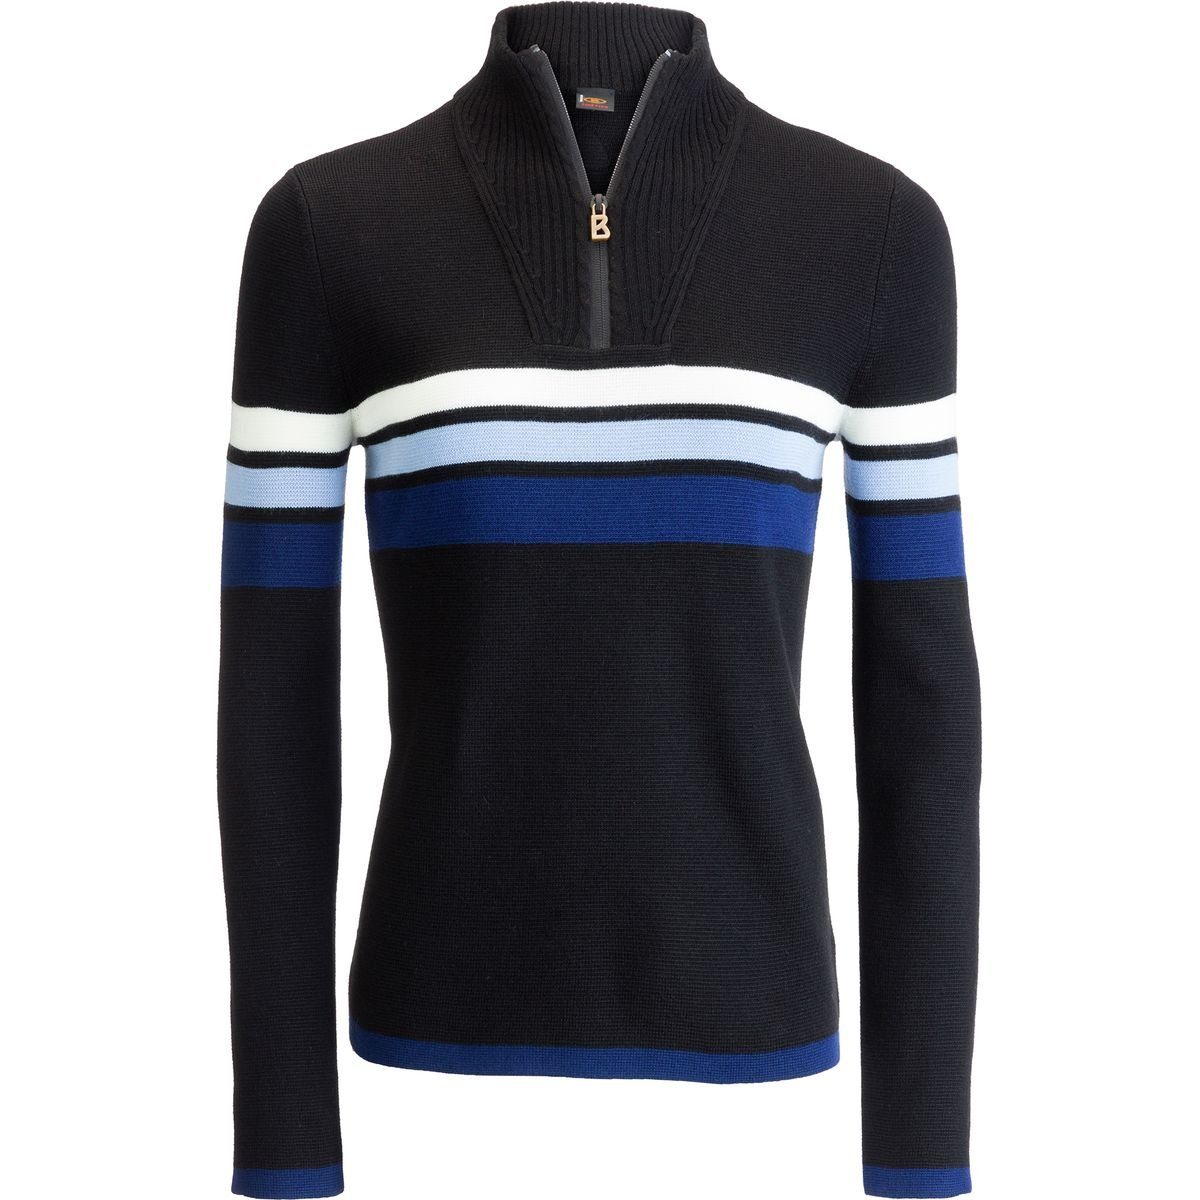 Bogner Fire + Ice Kaya Sweater - Women's Black, S by Bogner Fire + Ice